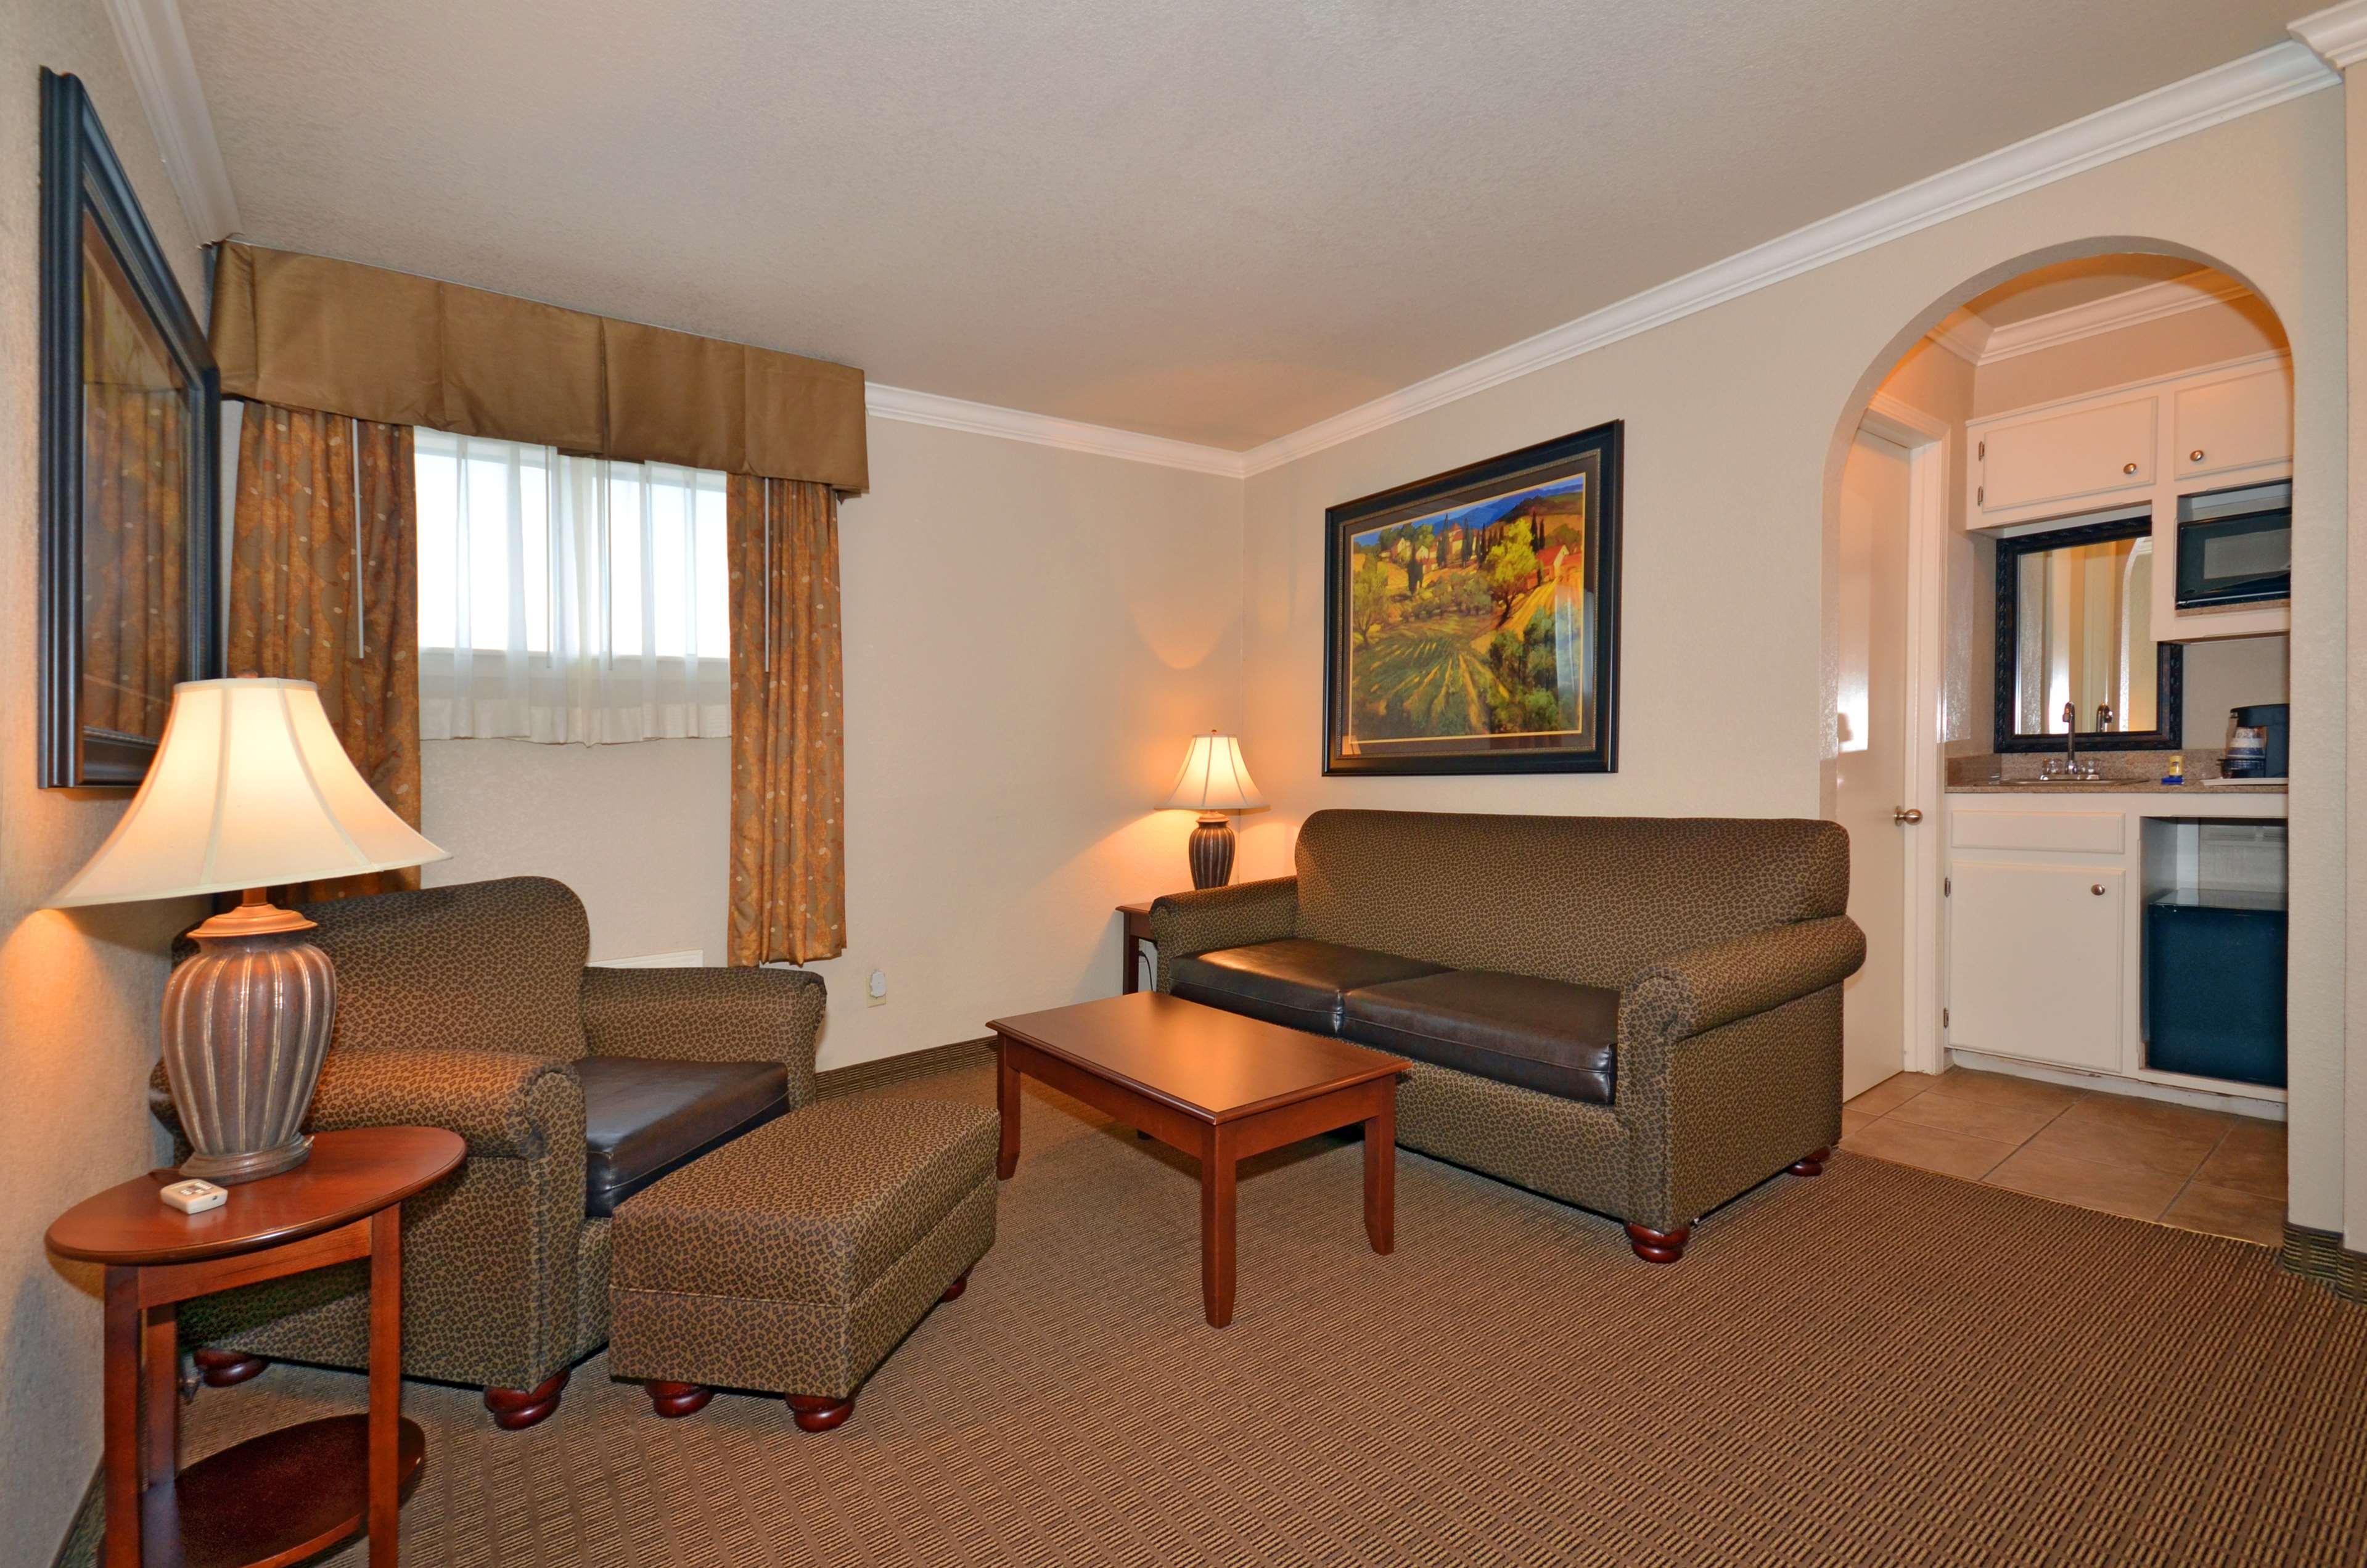 Best Western Inn of McAlester image 22